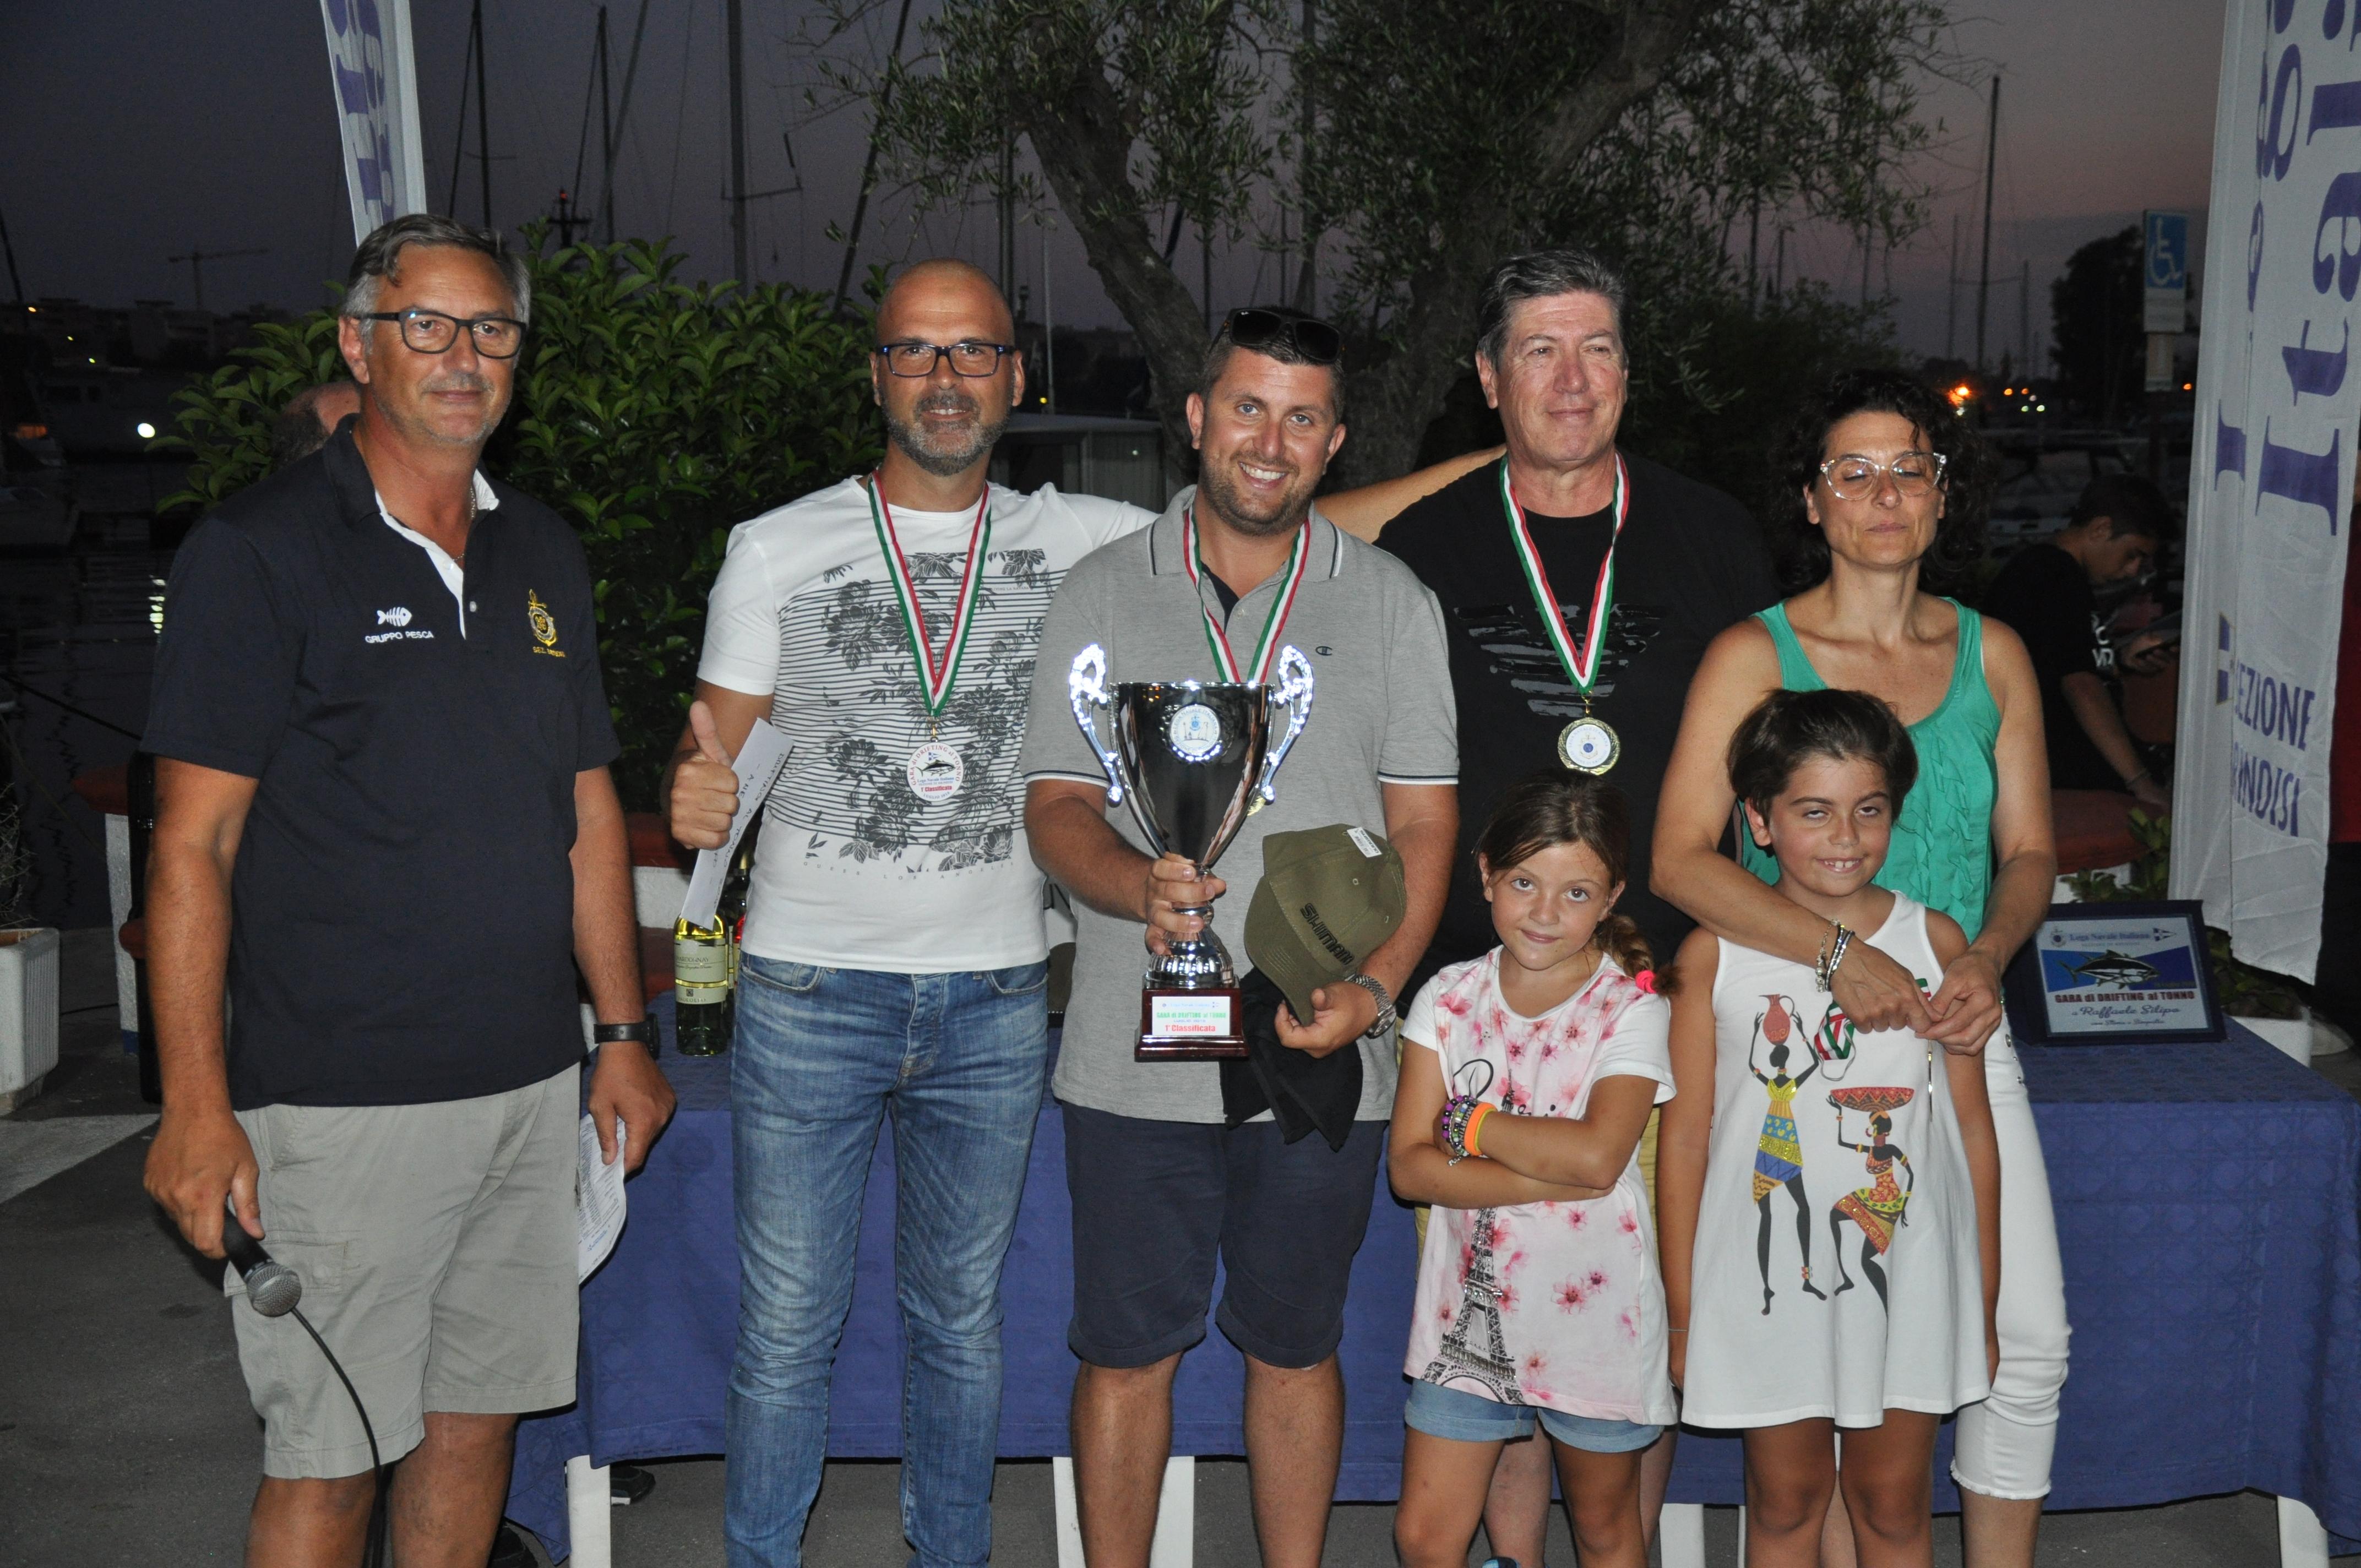 premiazione drifting al tonno 2018 (20)